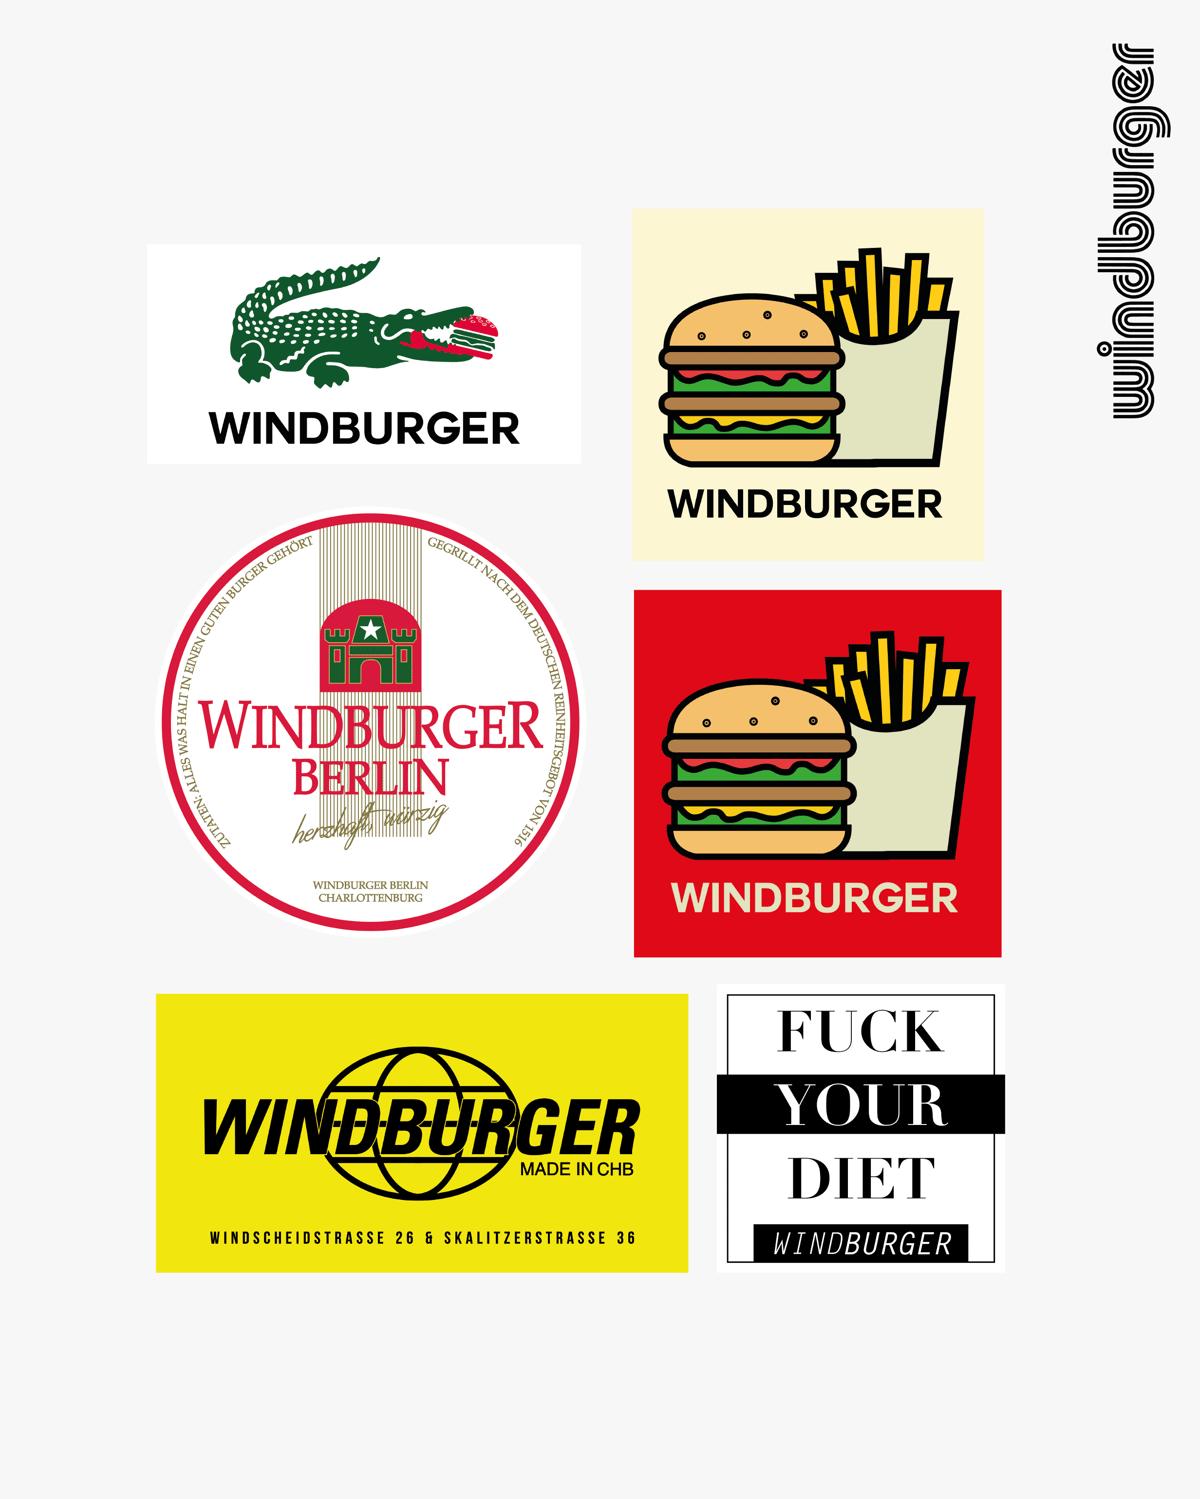 Image of windburger sticker bundle